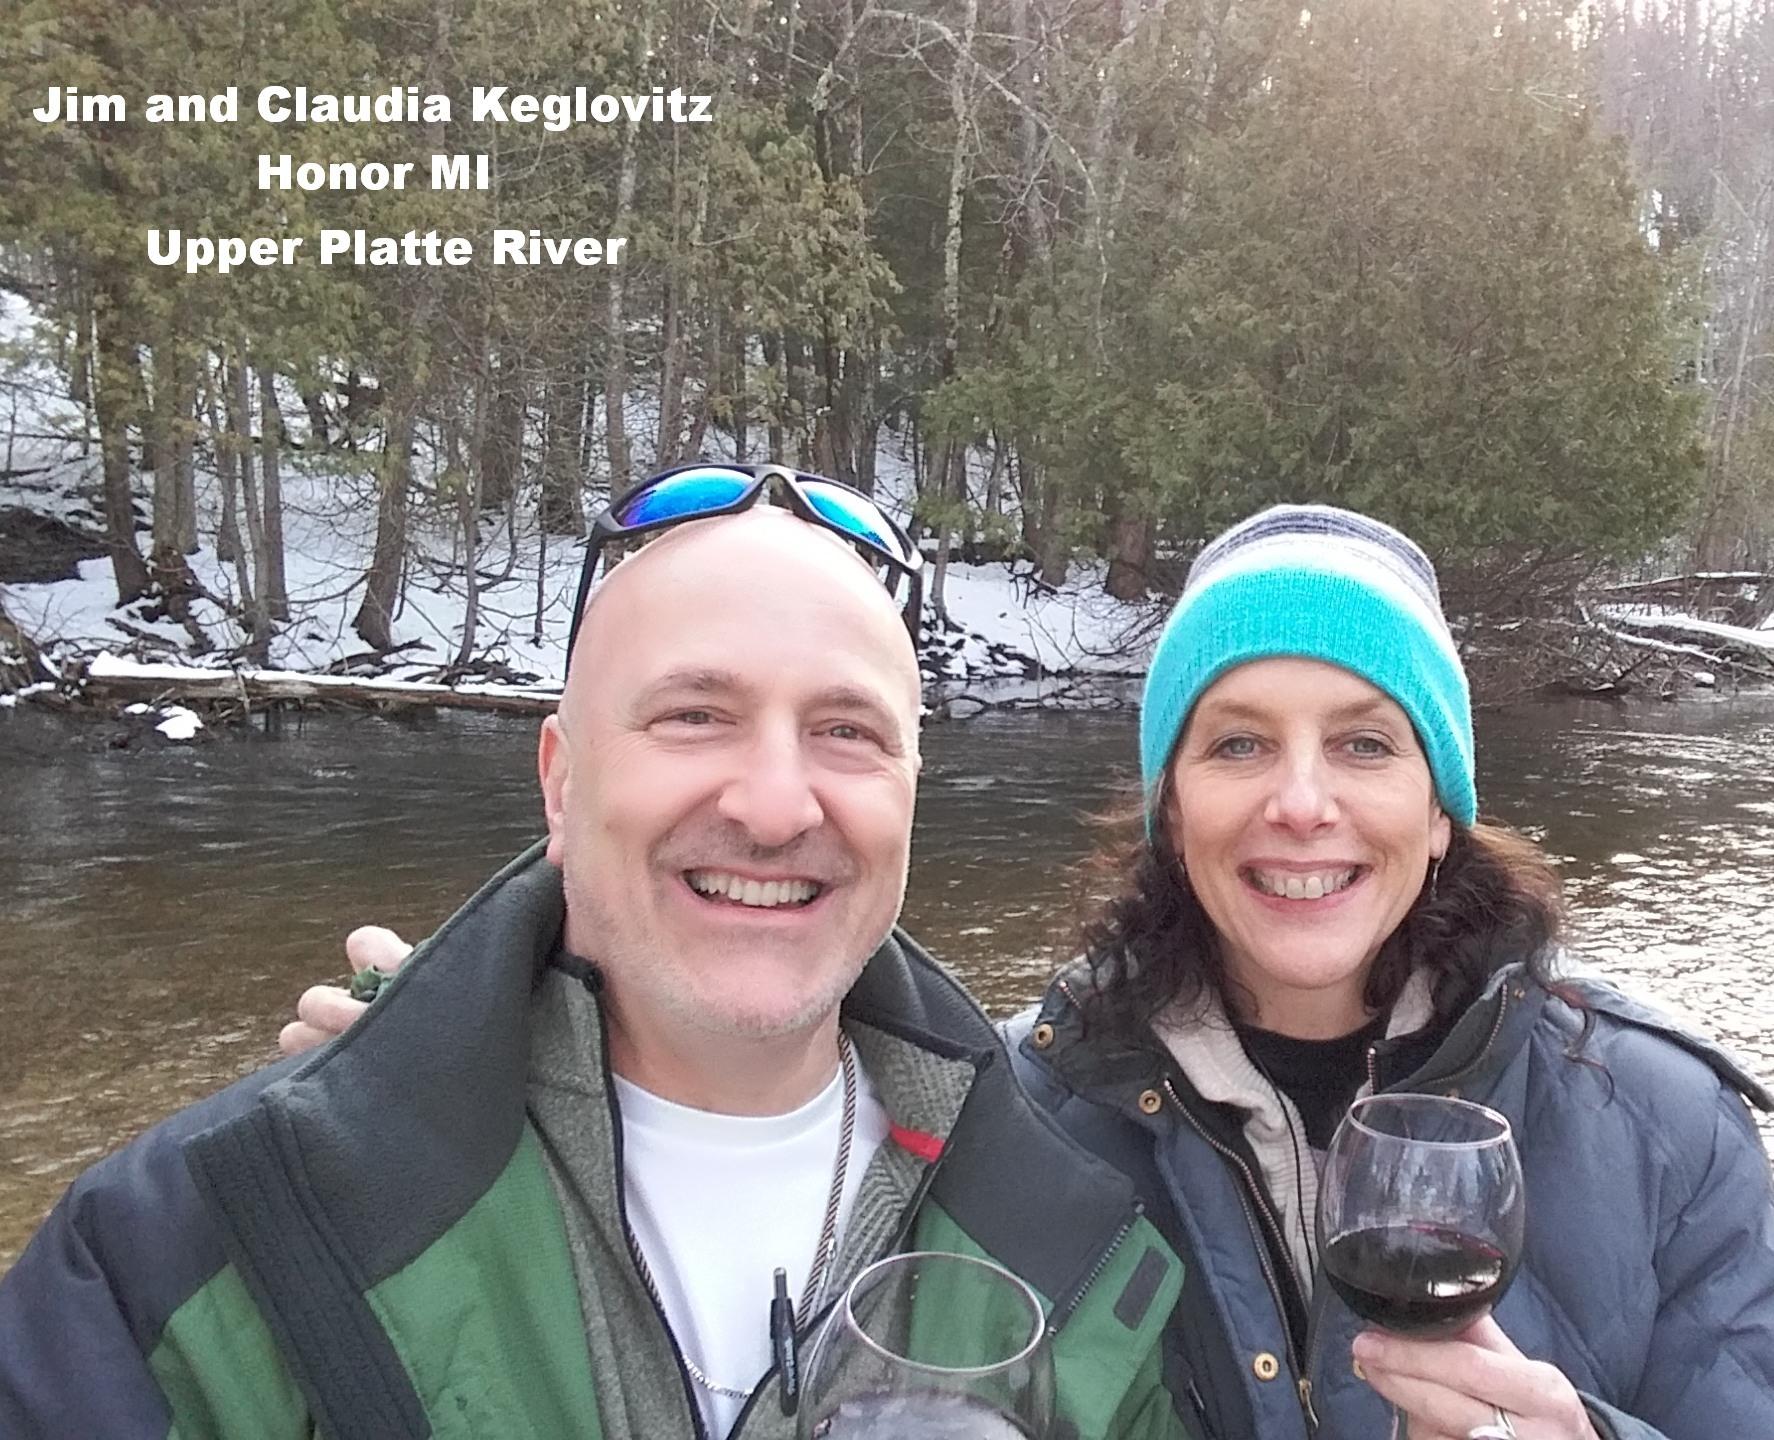 Jim and Claudia Keglovitz of Honor